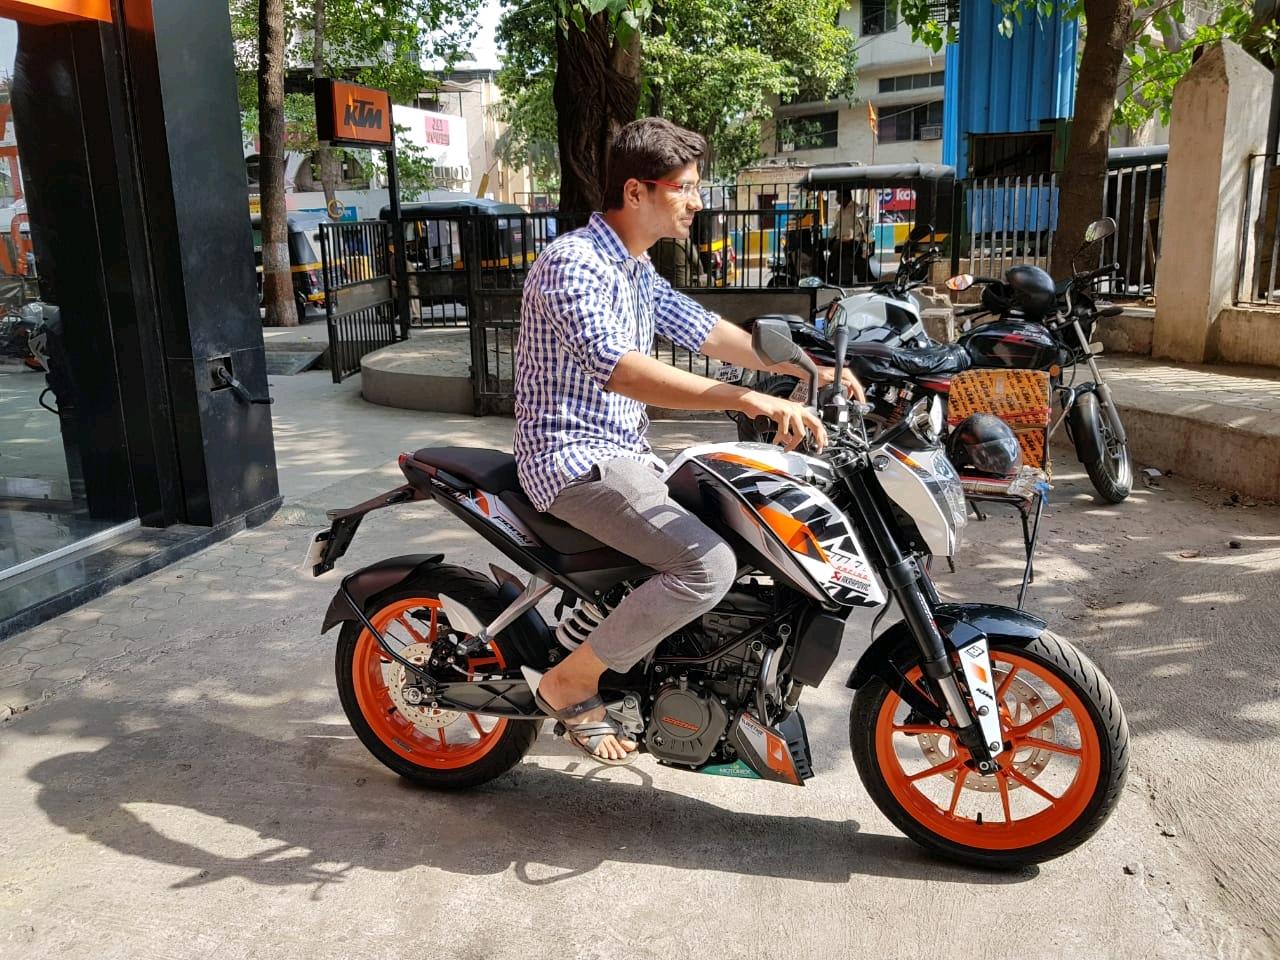 KTM super sports bike - KTM DUKE 200 Customer Review